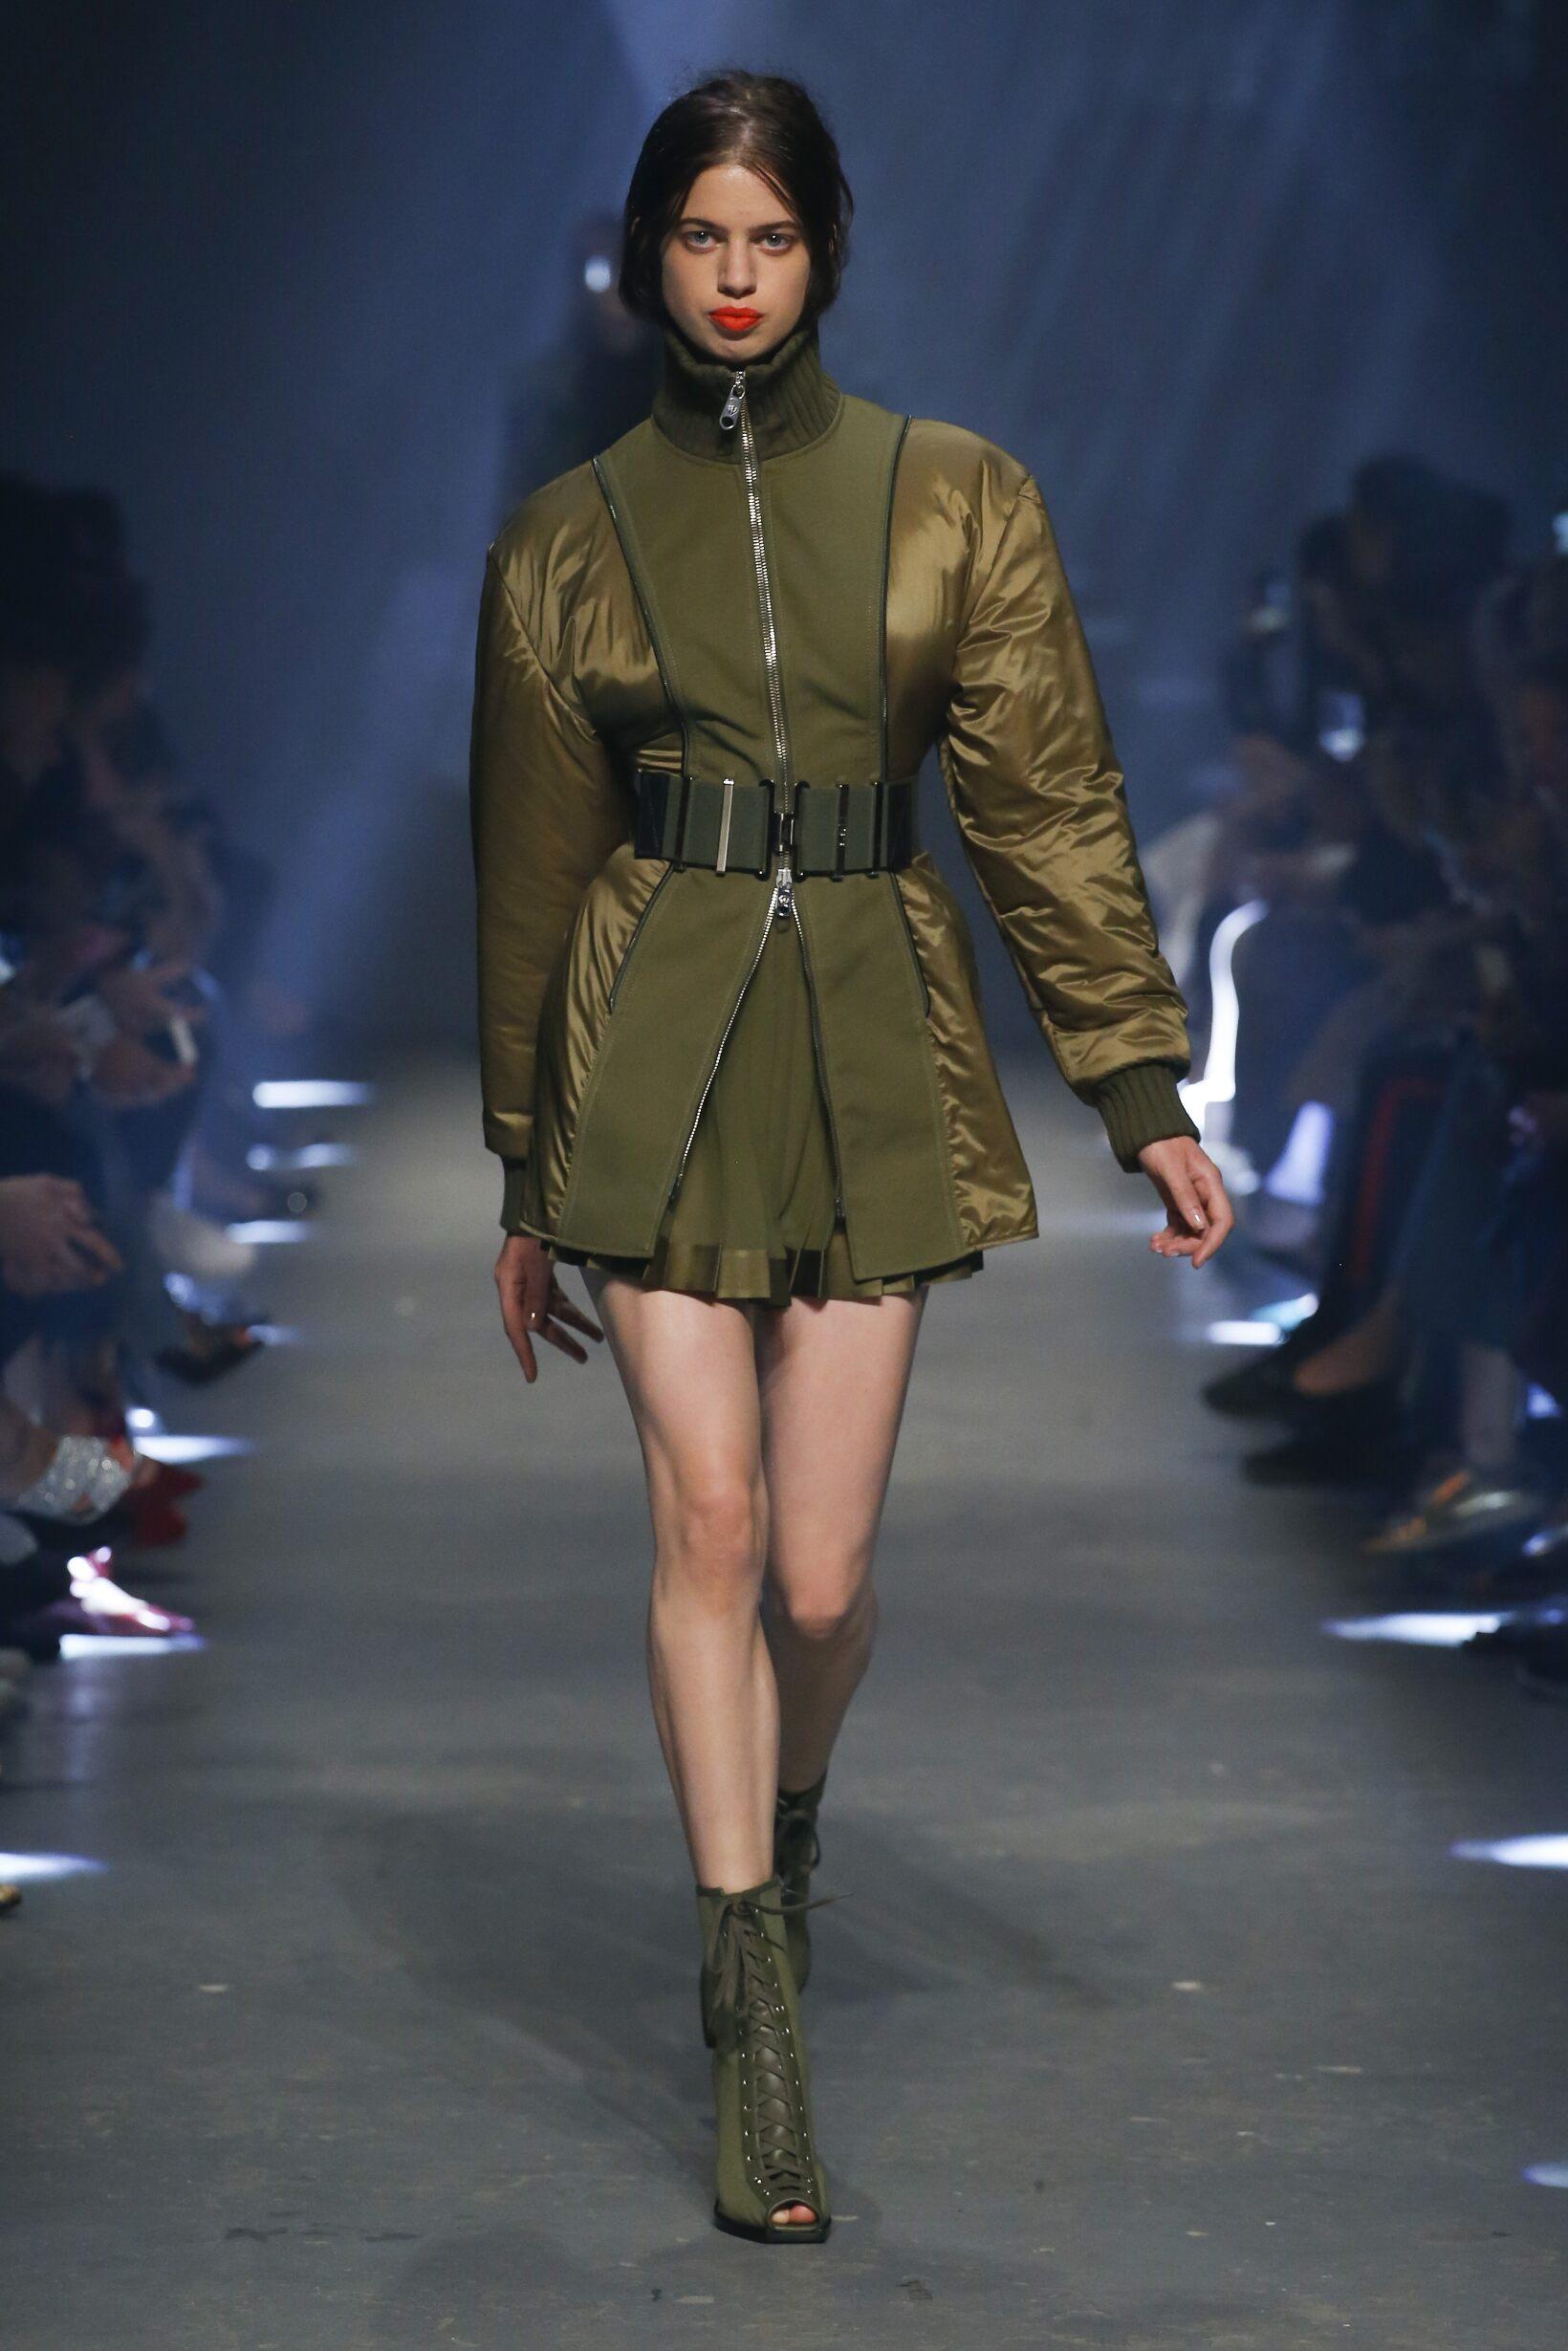 Fashion Model Versus Versace Catwalk